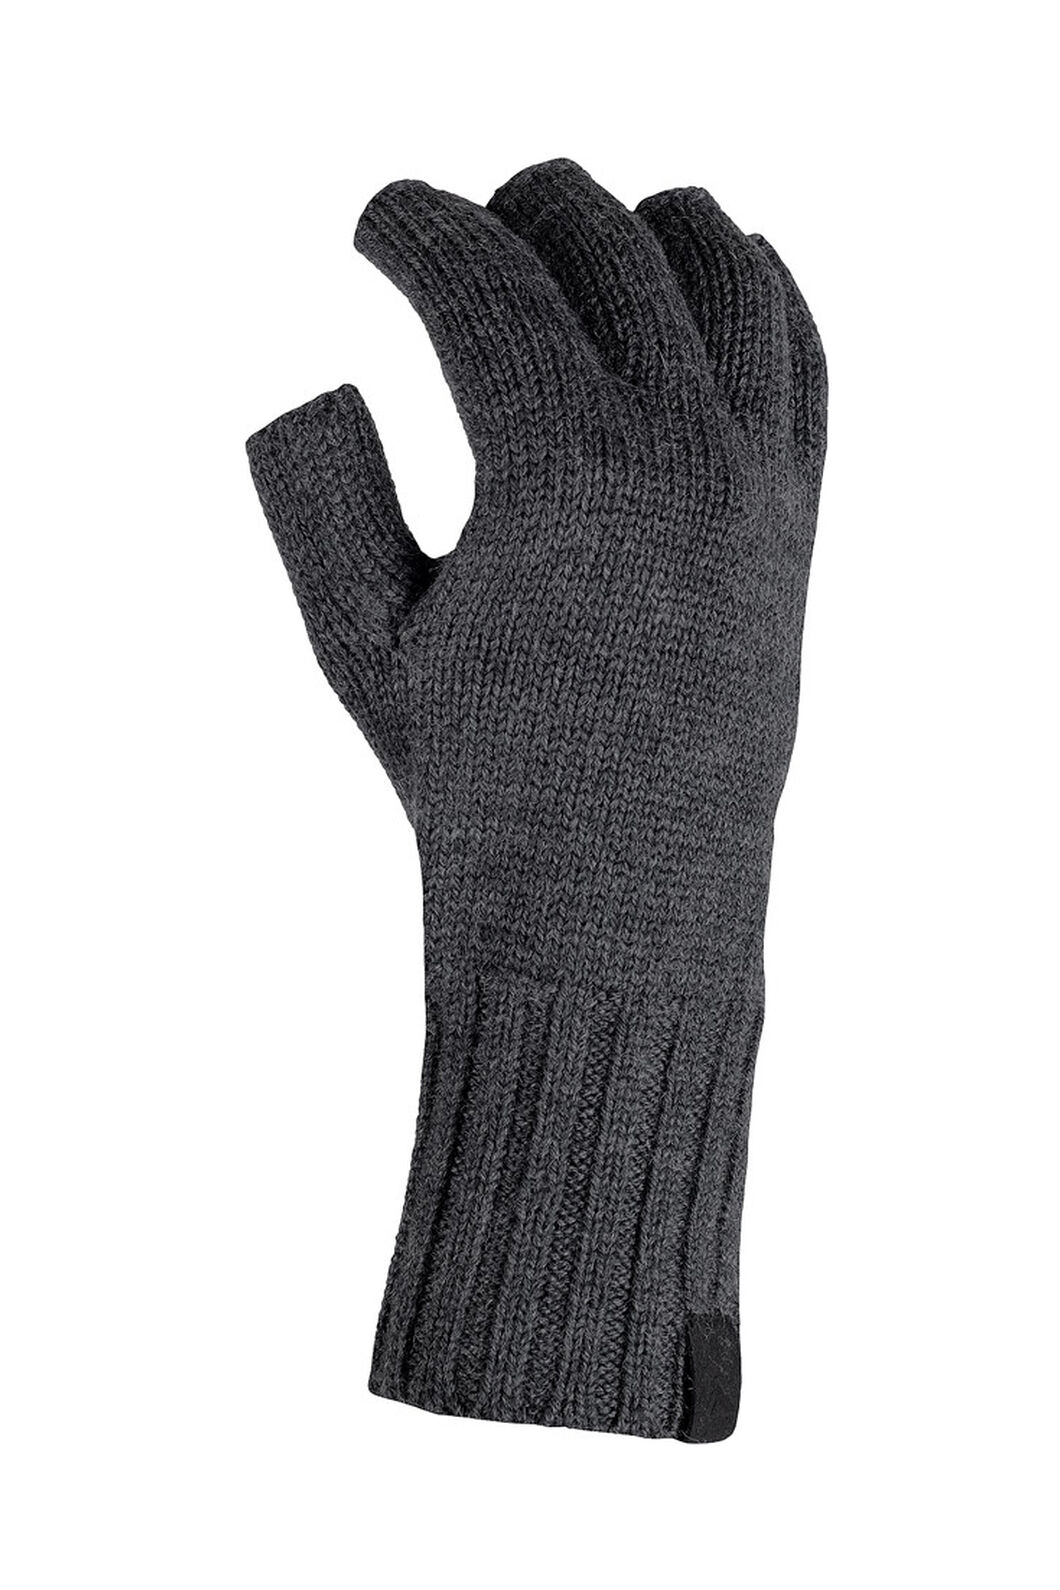 Macpac Merino Fingerless Gloves, Charcoal Marle, hi-res